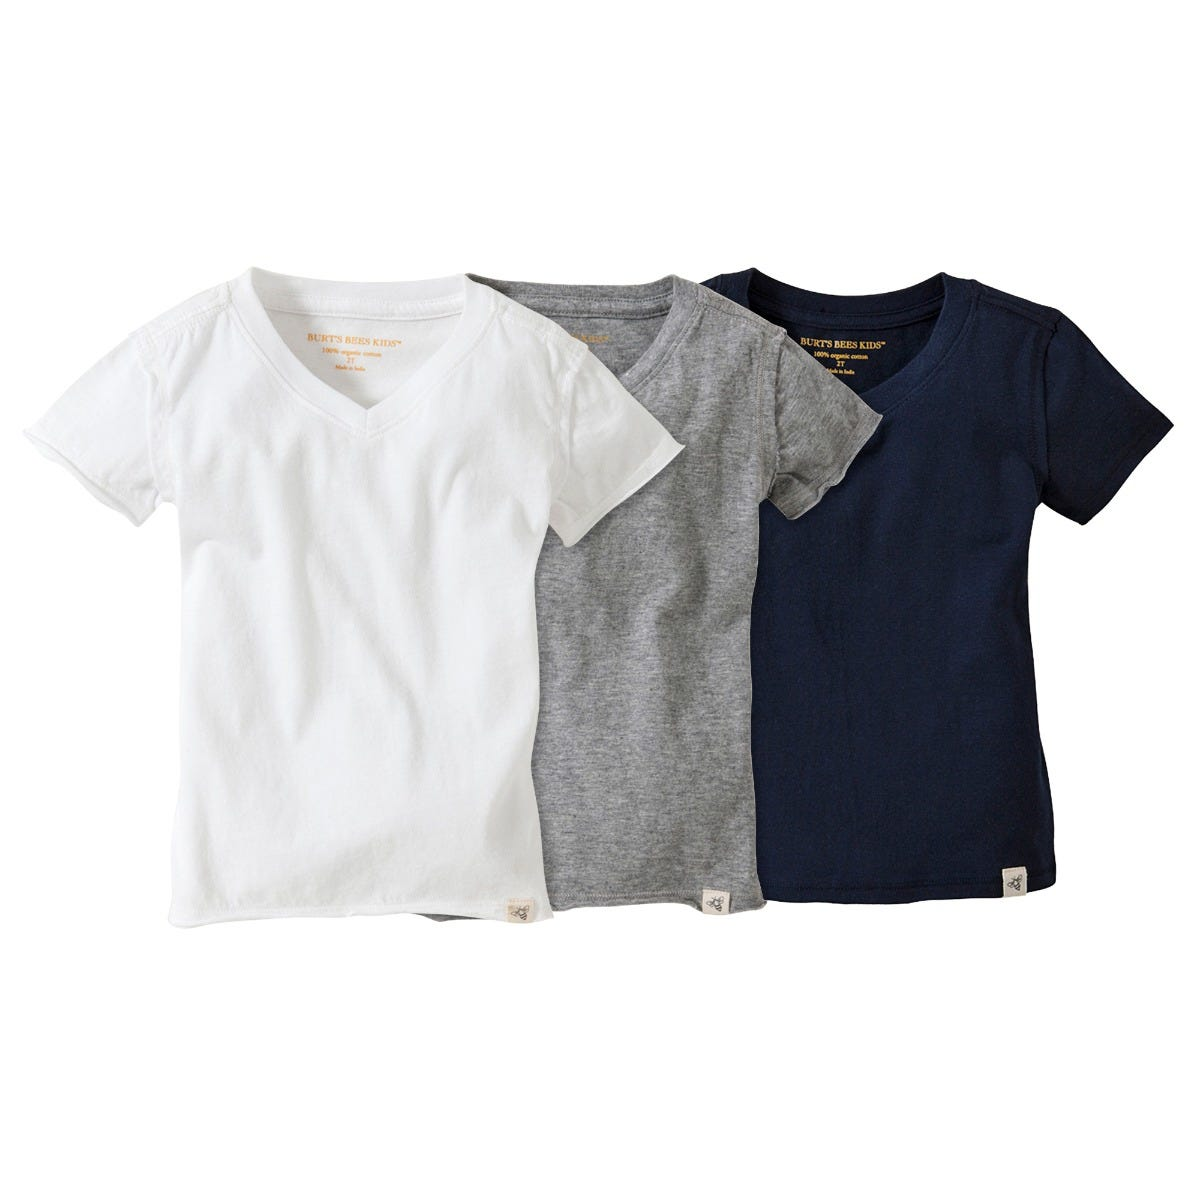 Baby Boys T-Shirt 100/% Organic Cotton Burts Bees Baby Short Sleeve V-Neck and Crewneck Tees